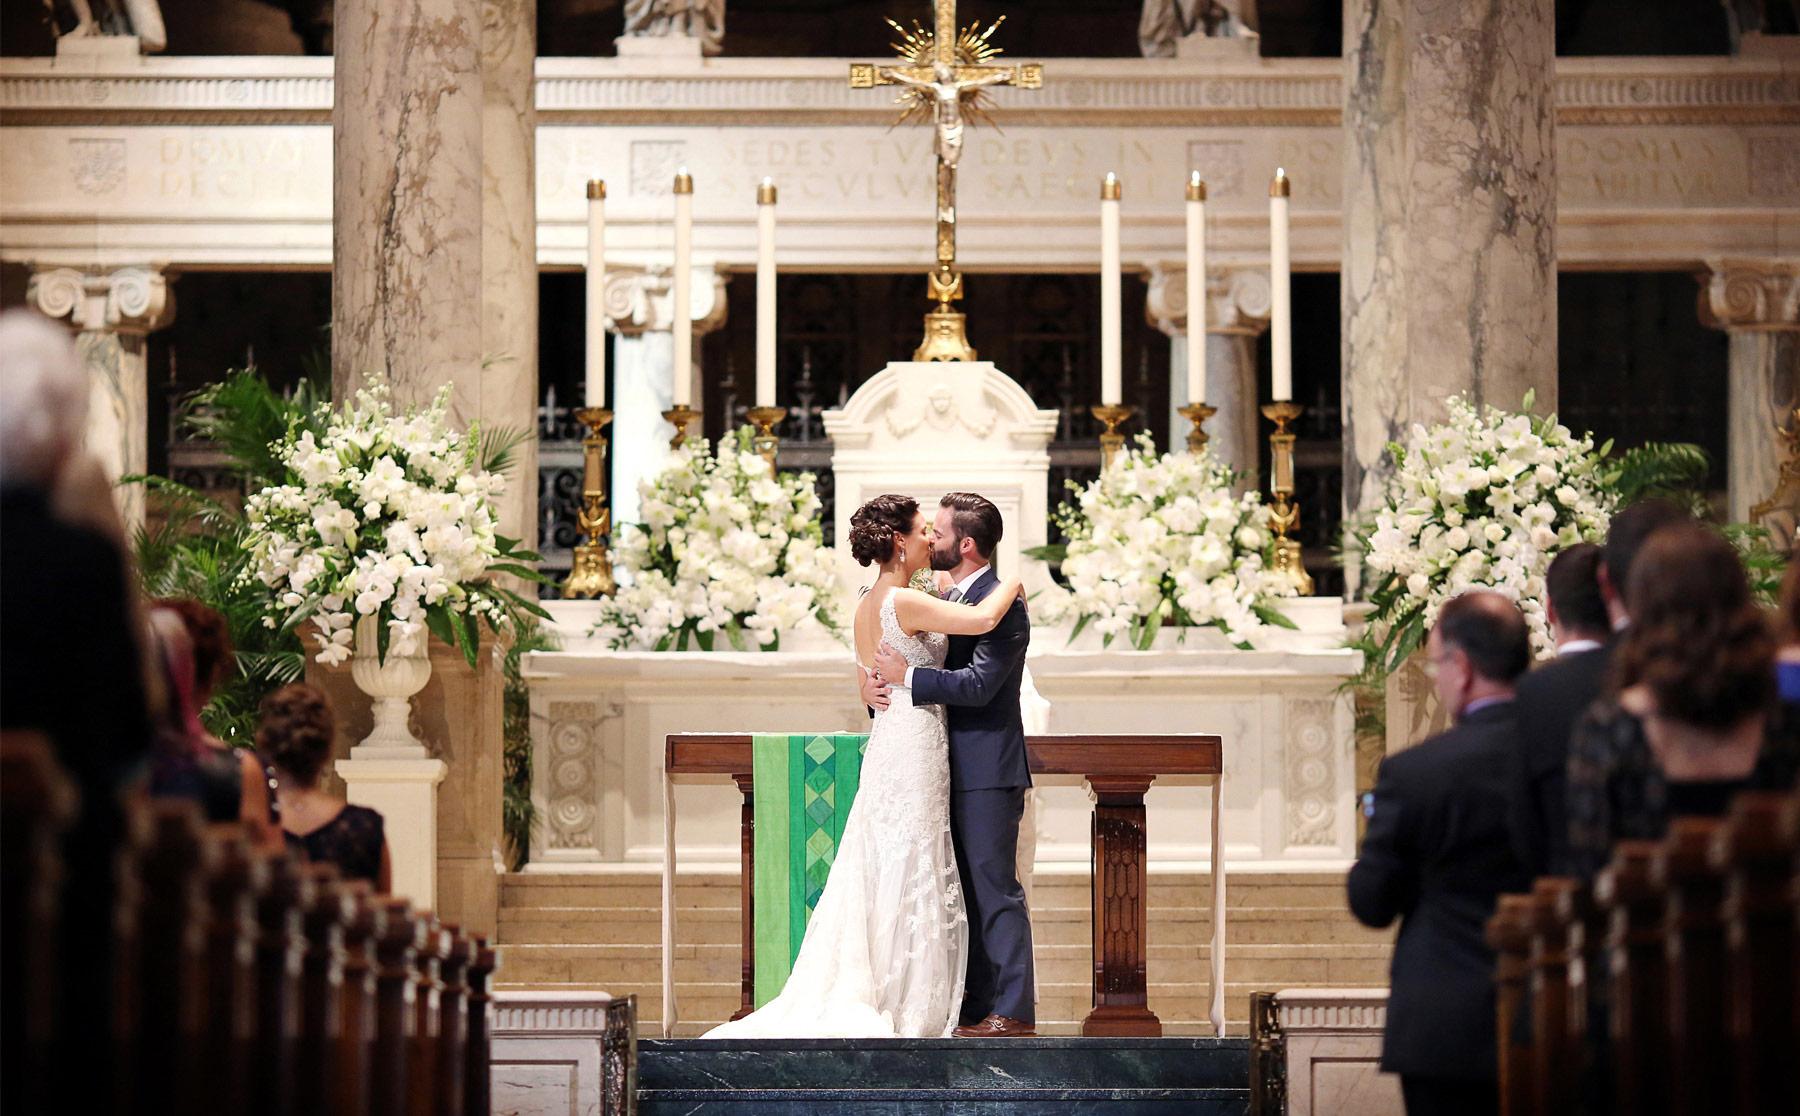 14-Minneapolis-Minnesota-Wedding-Photographer-by-Andrew-Vick-Photography-Summer-Basilica-of-Saint-Mary-Church-Ceremony-Bride-Groom-Kiss-Ashley-and-Eric.jpg